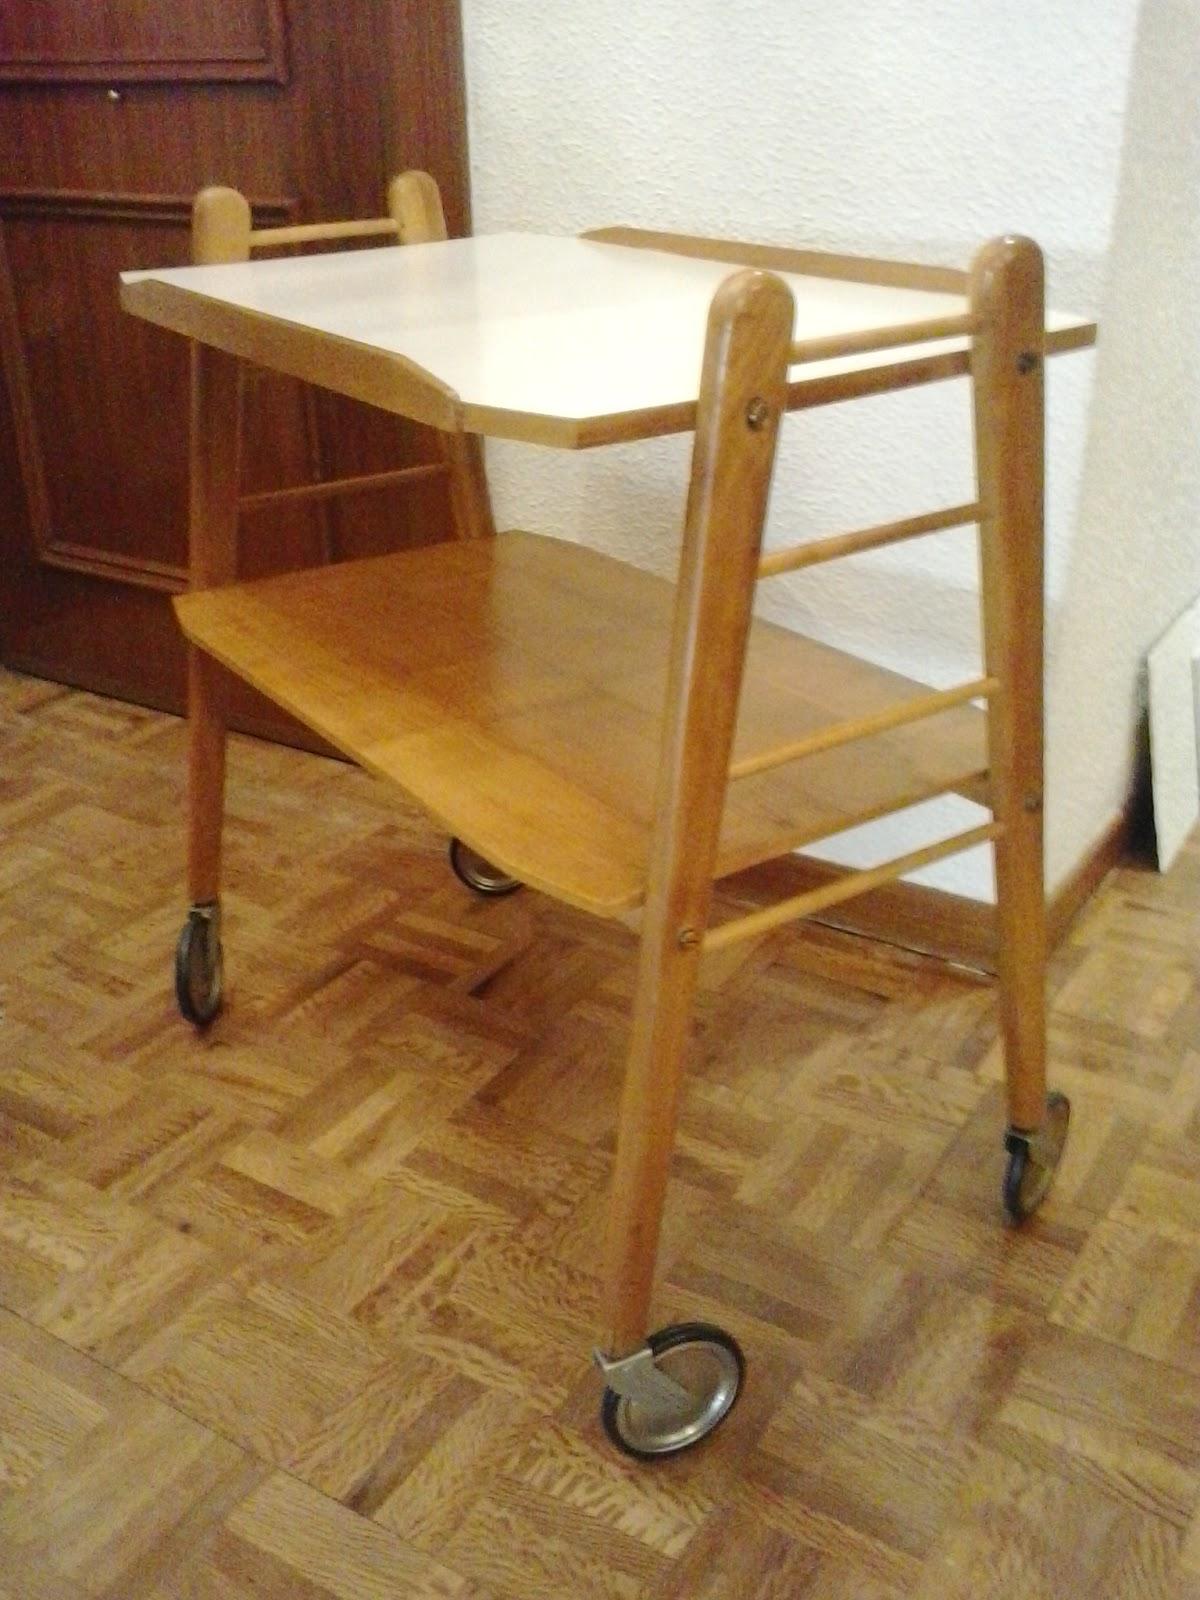 Area vintage dise o mesa auxiliar con ruedas camarera - Mesa auxiliar con ruedas ...